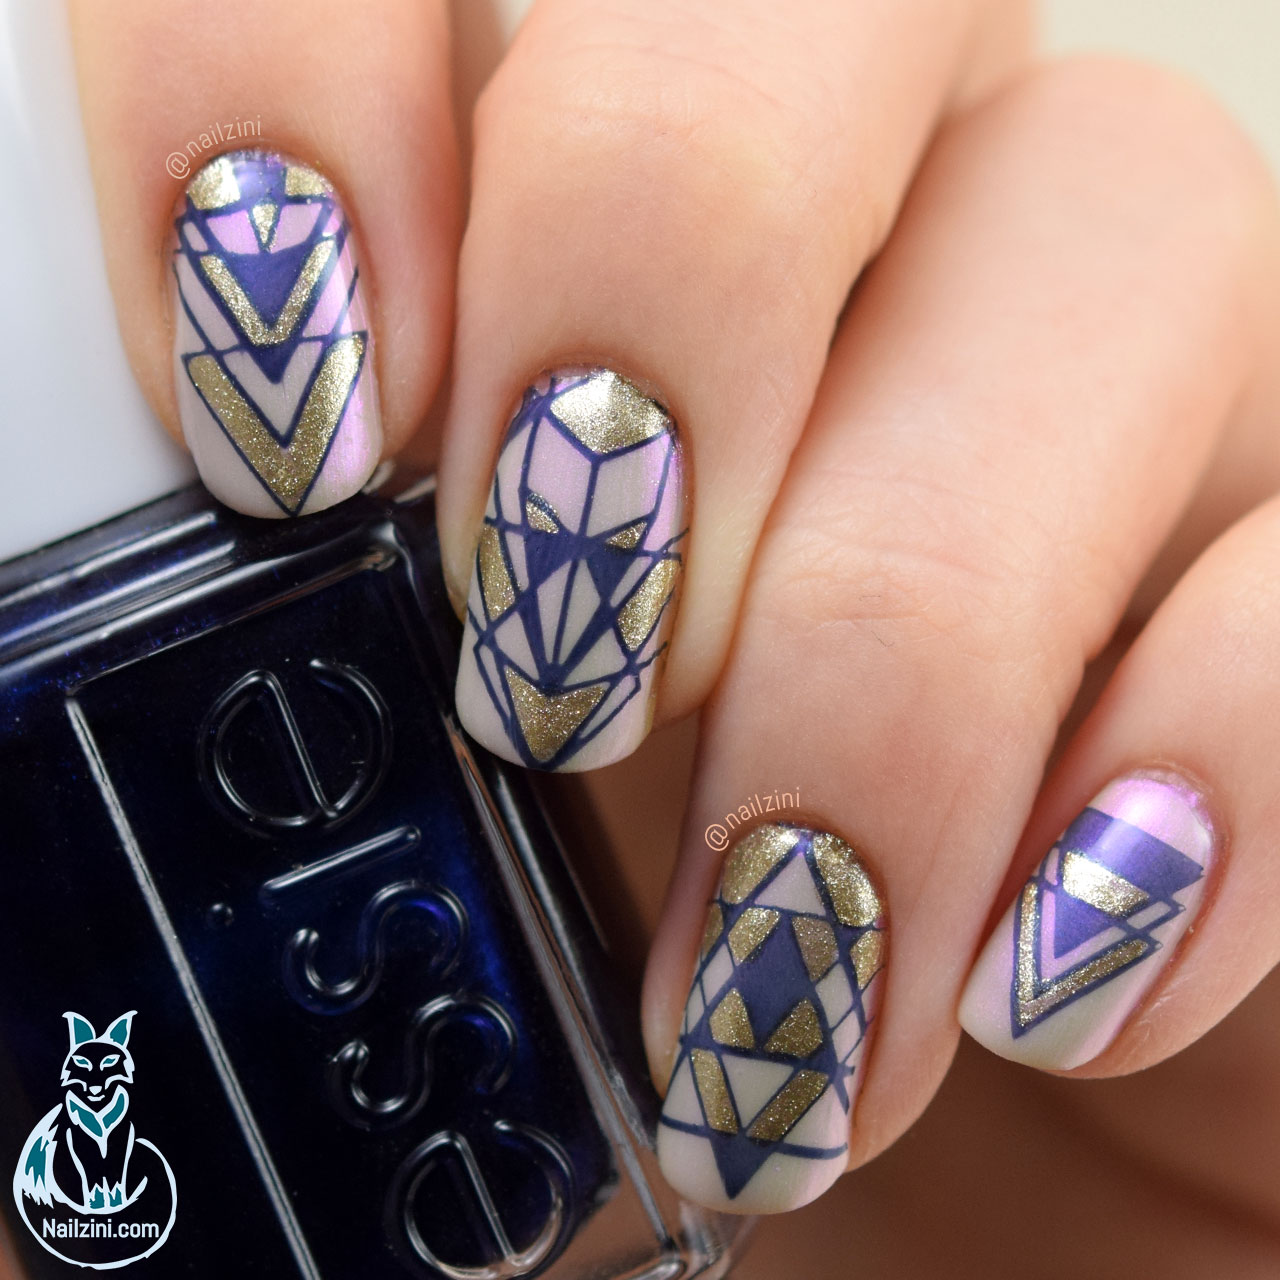 Nailzini A Nail Art Blog: Geometric Reverse Stamping Nail Art -- Born Pretty Review